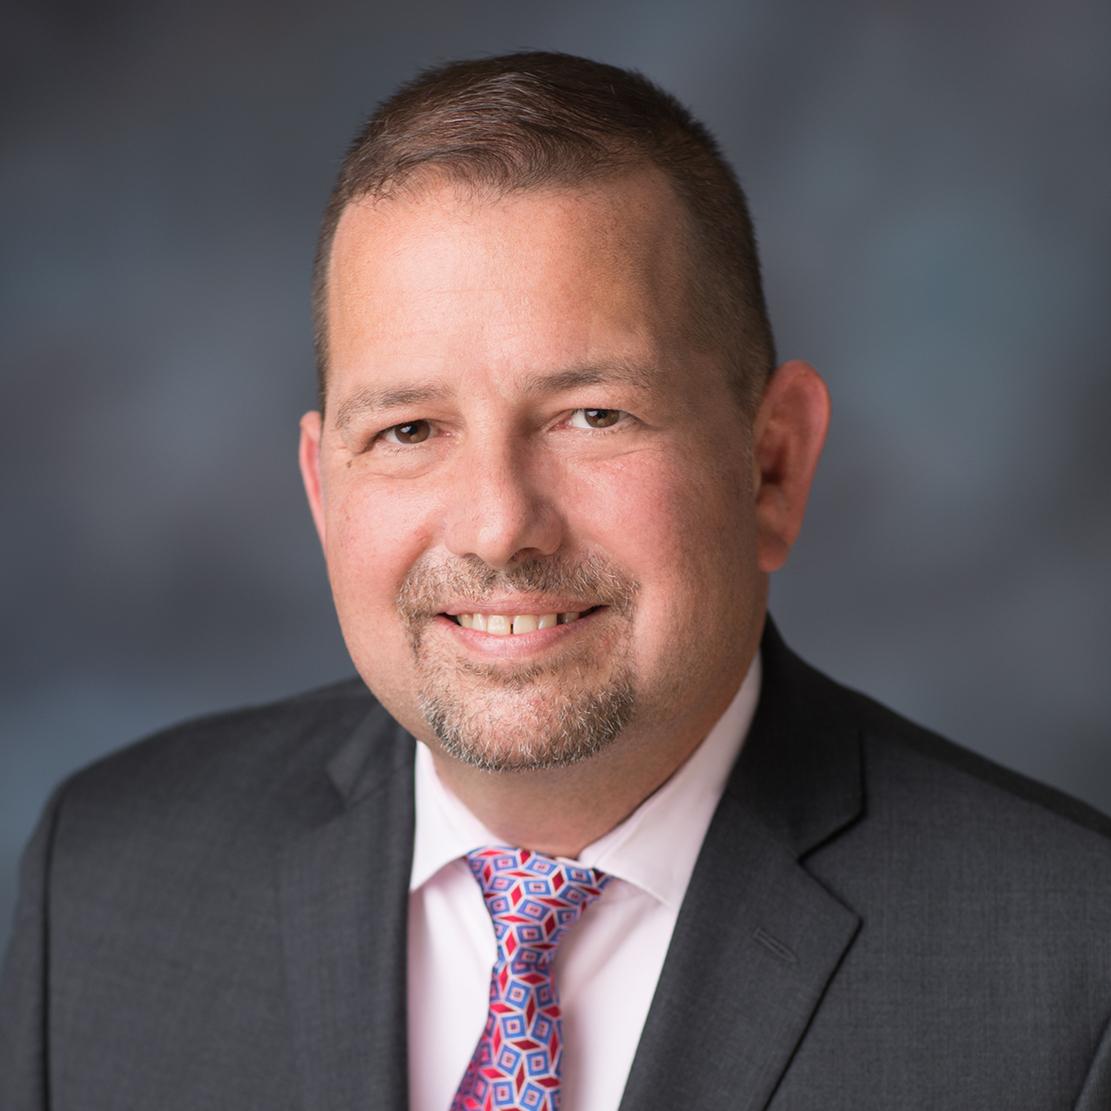 John Palmeri professional headshot